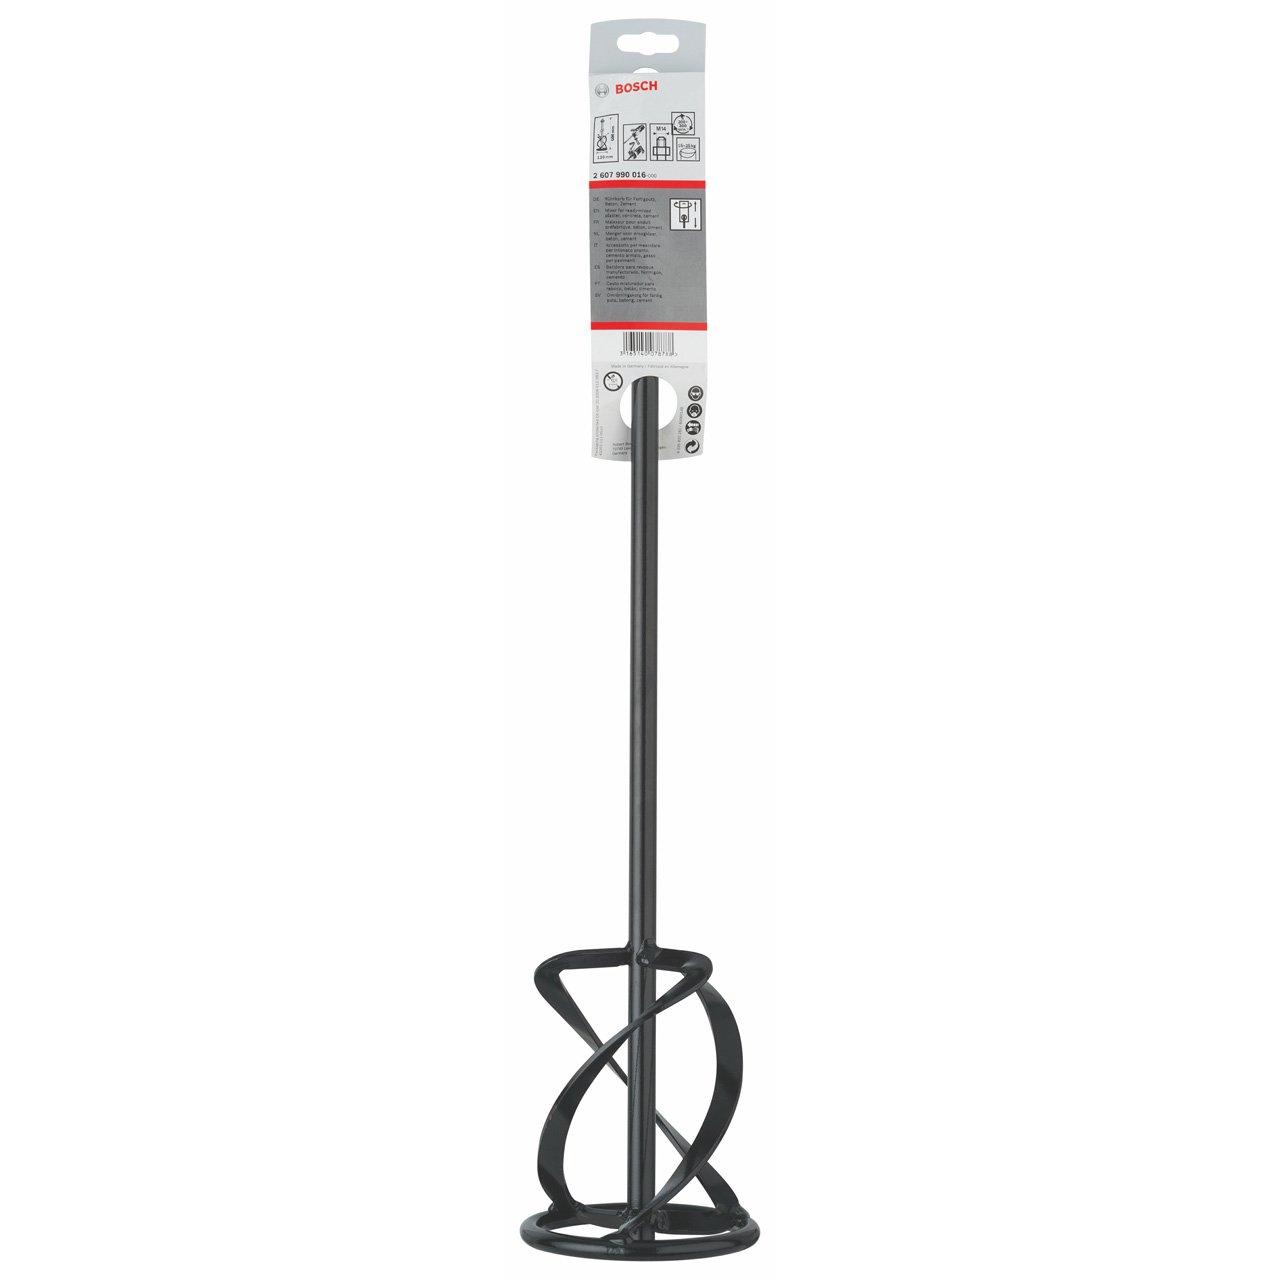 Bosch Zubehö r 2607990016 Rü hrkorb 120 mm, 600 mm, 15-25 kg